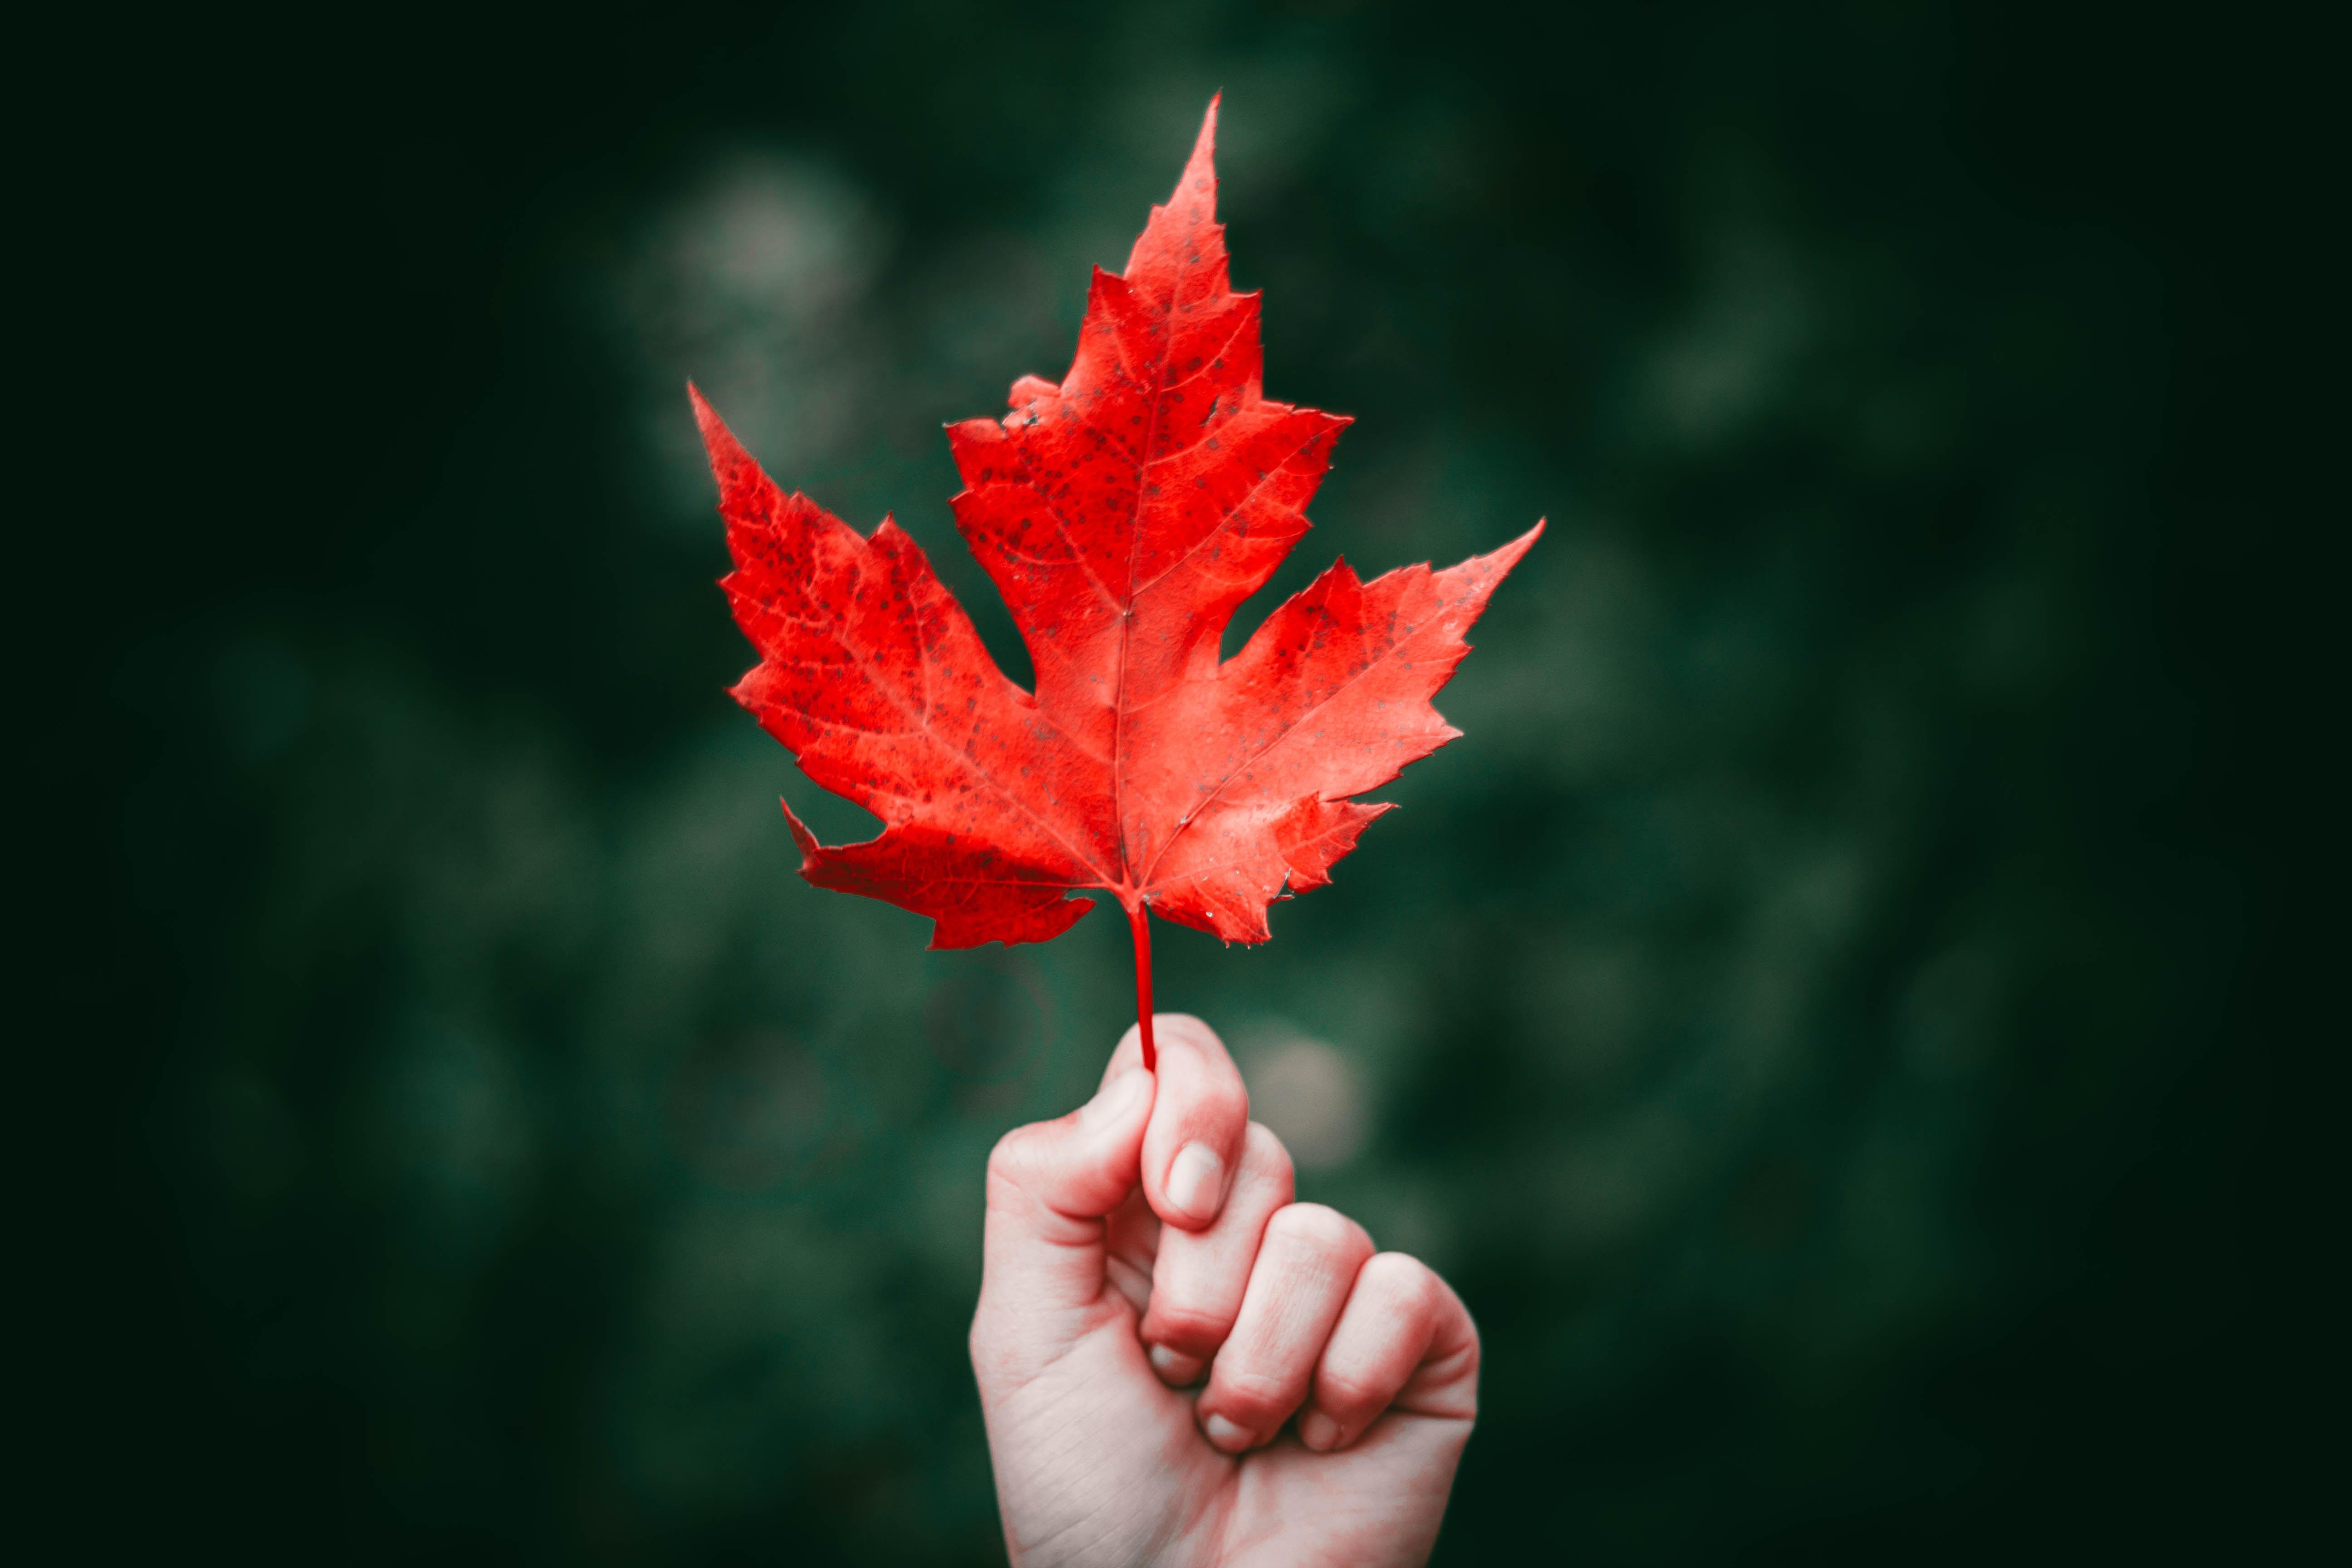 Autumn autumn-poetry-2018 stories